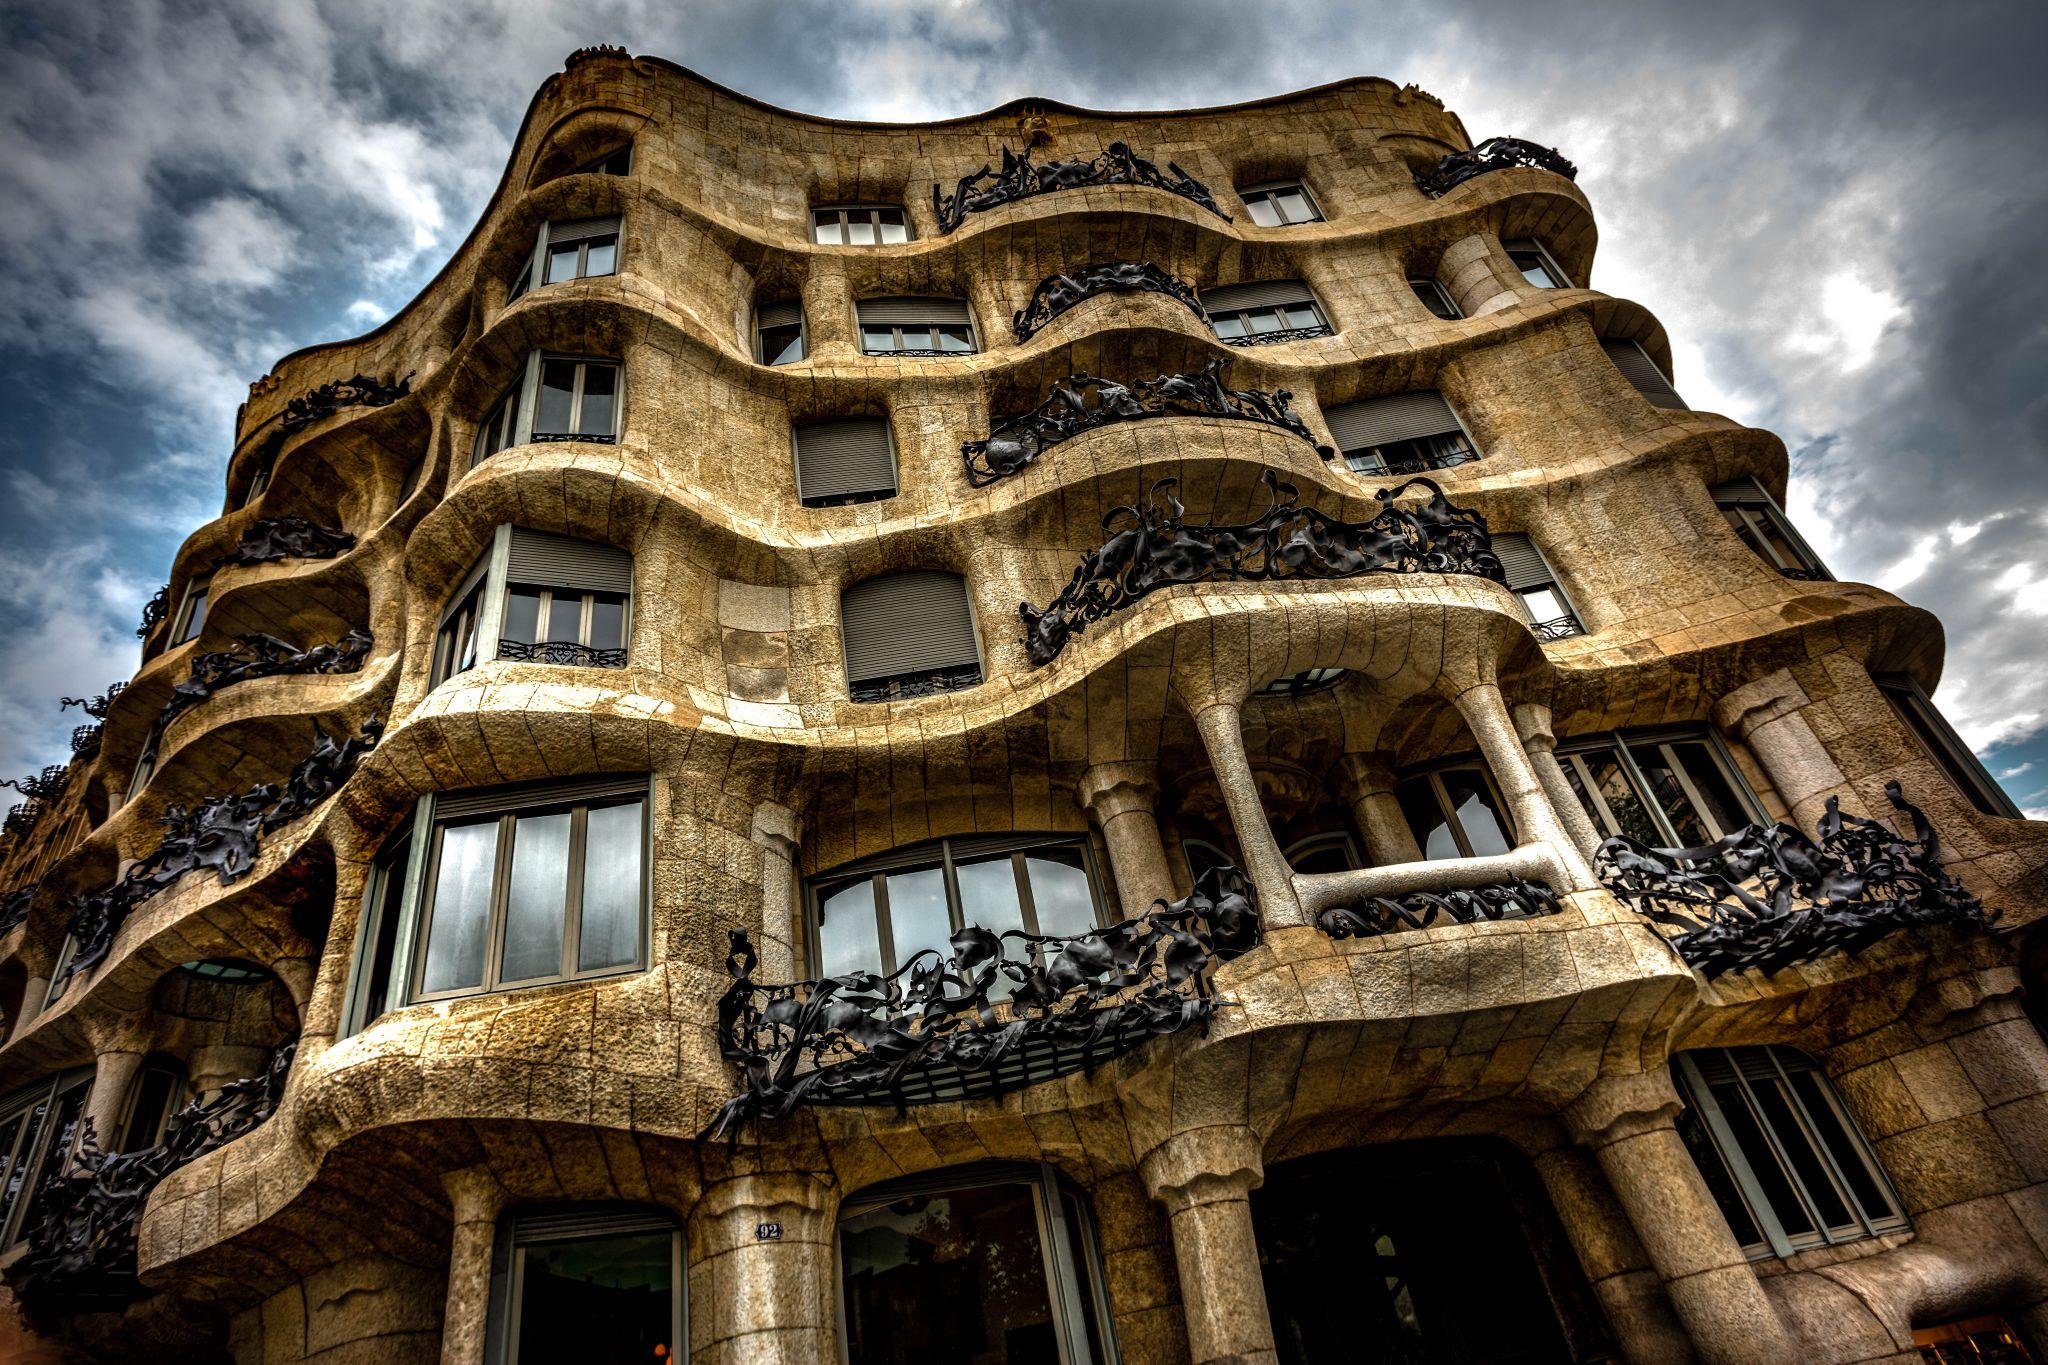 Casa Mila, Spain